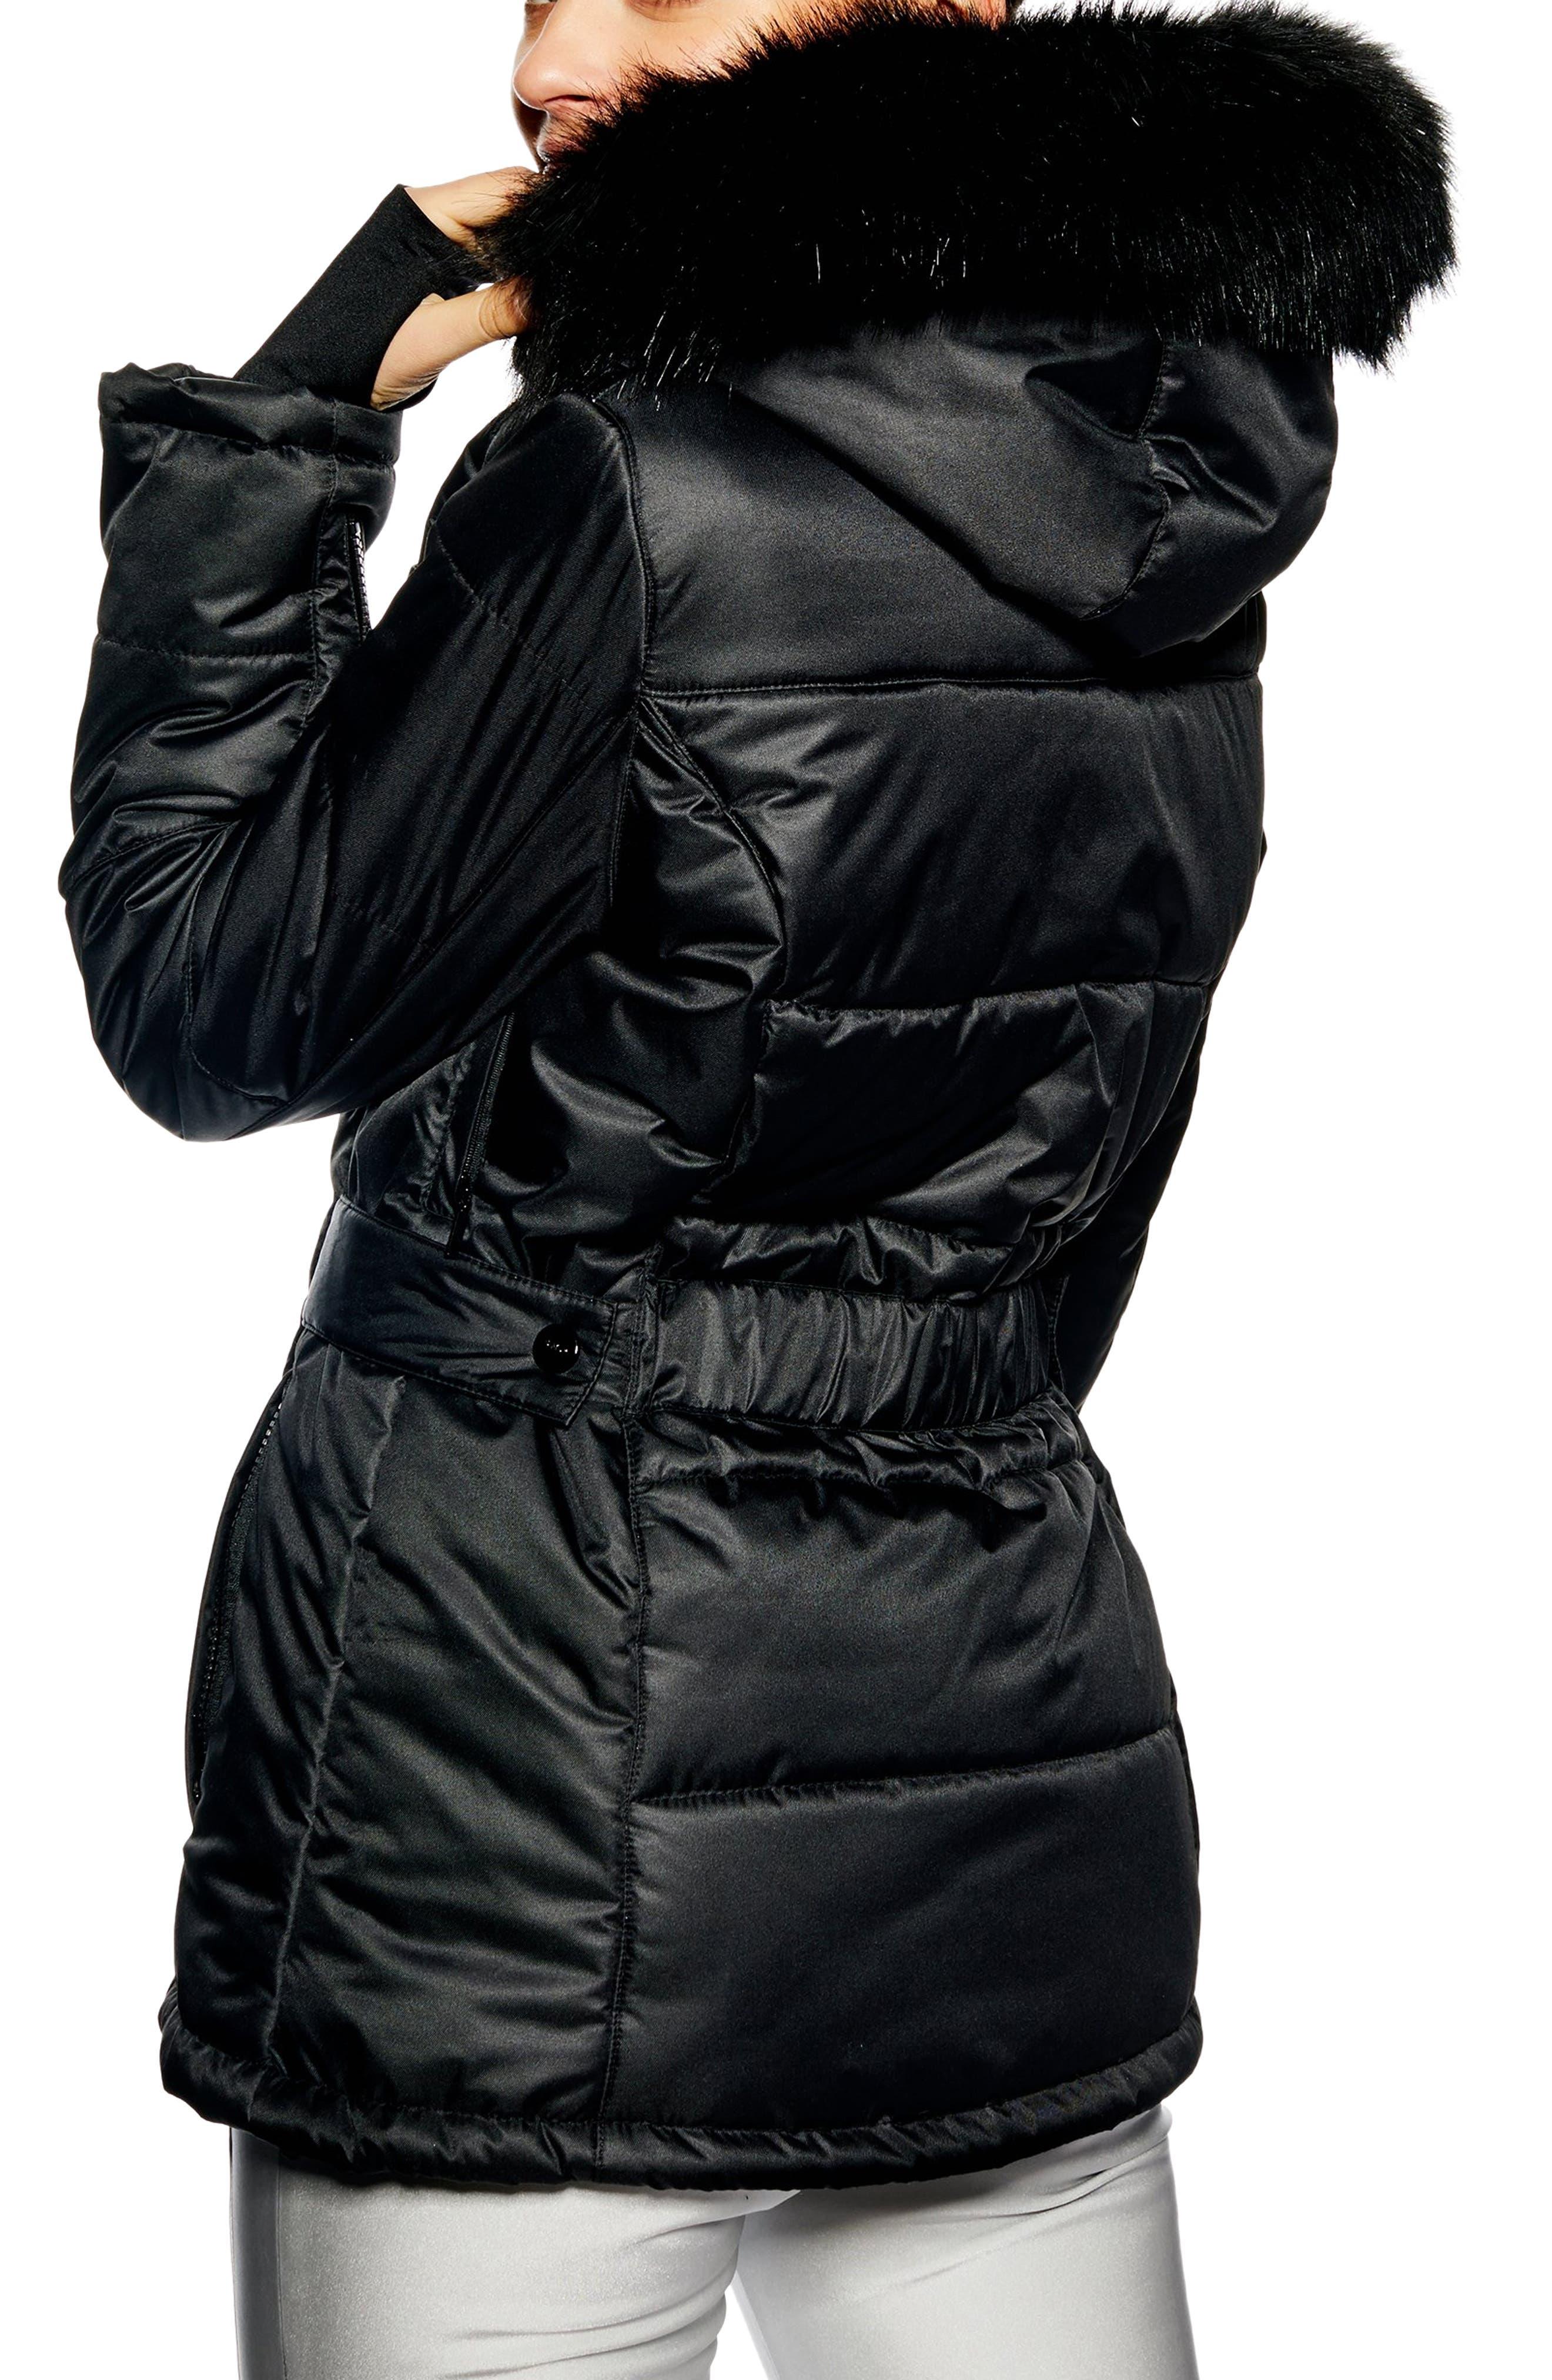 Sno Baby Ski Jacket,                             Alternate thumbnail 2, color,                             BLACK